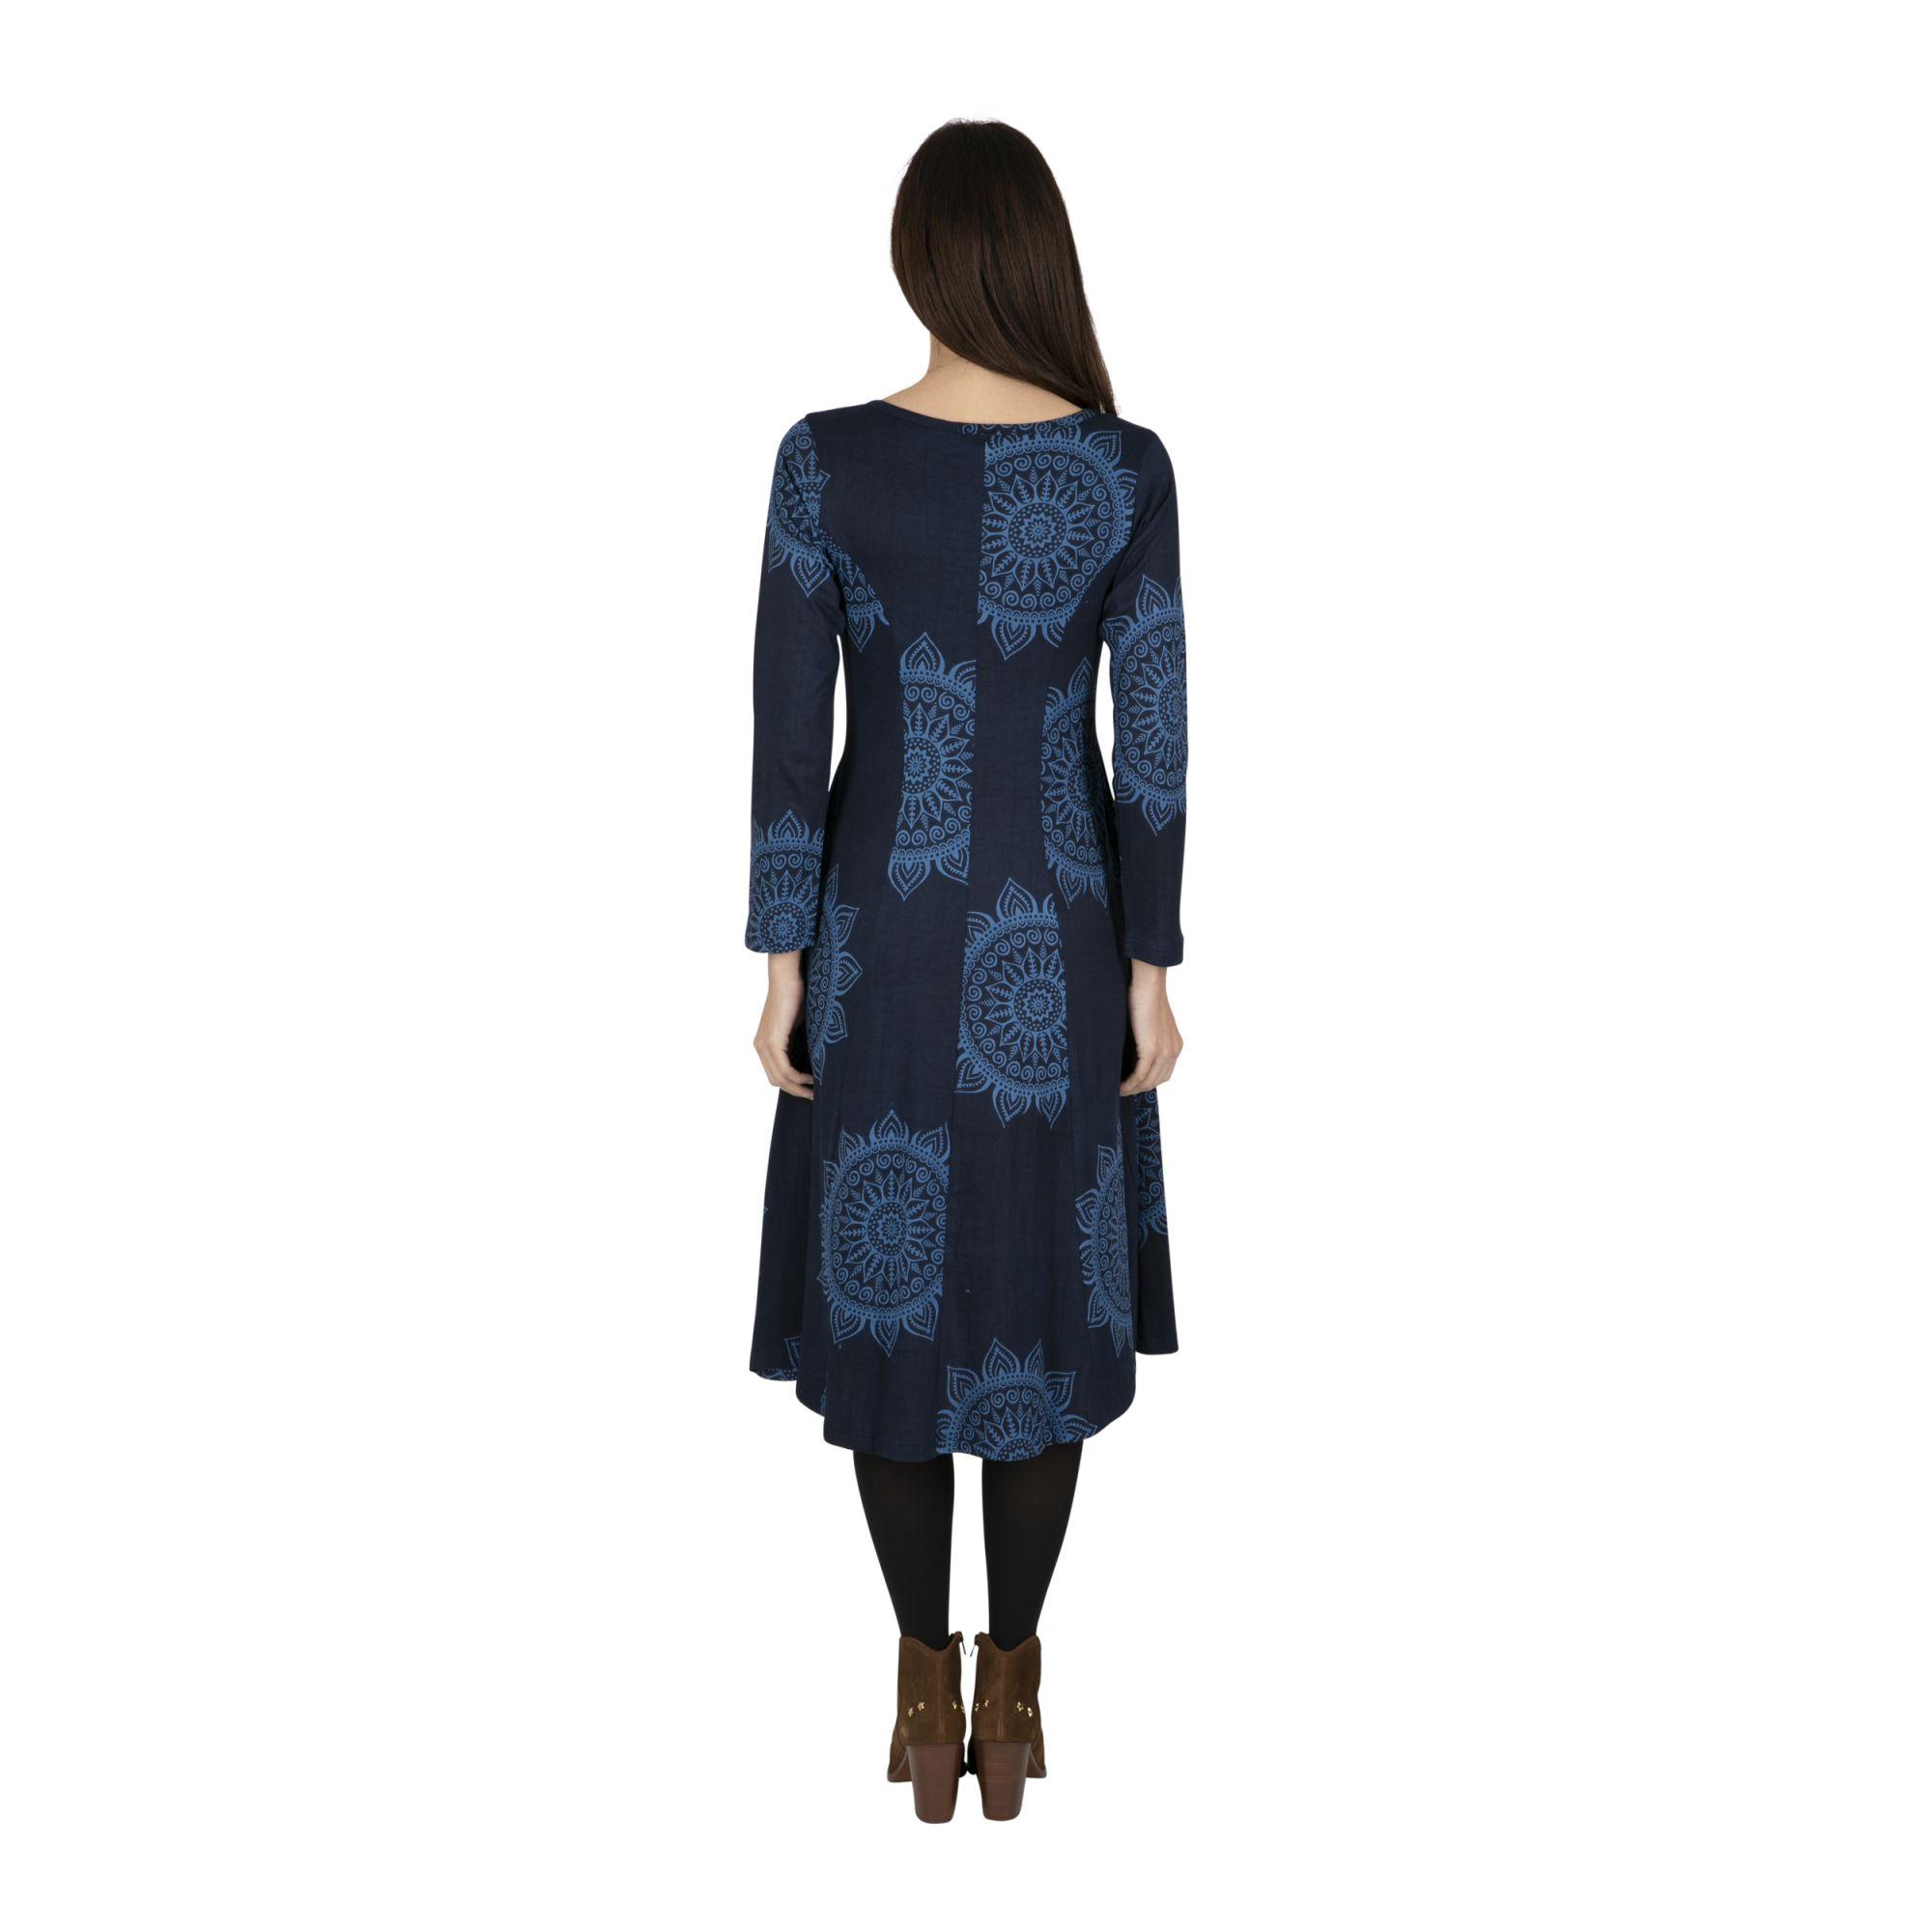 Robe mi-longue imprimée et originale pour femme Umutara